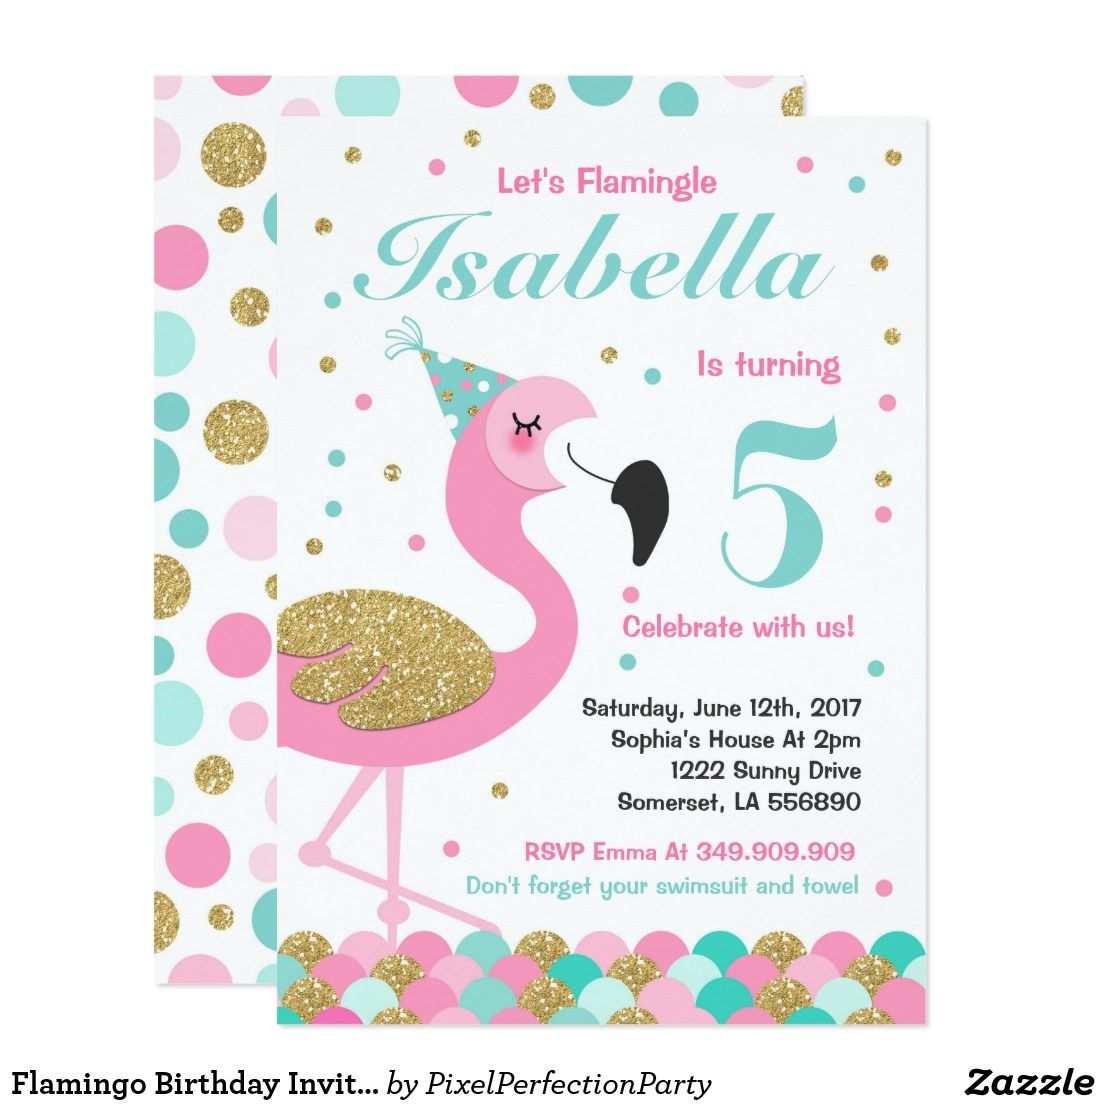 Flamingo Geburtstags Einladungs Aktuelles Einladung Zazzle De